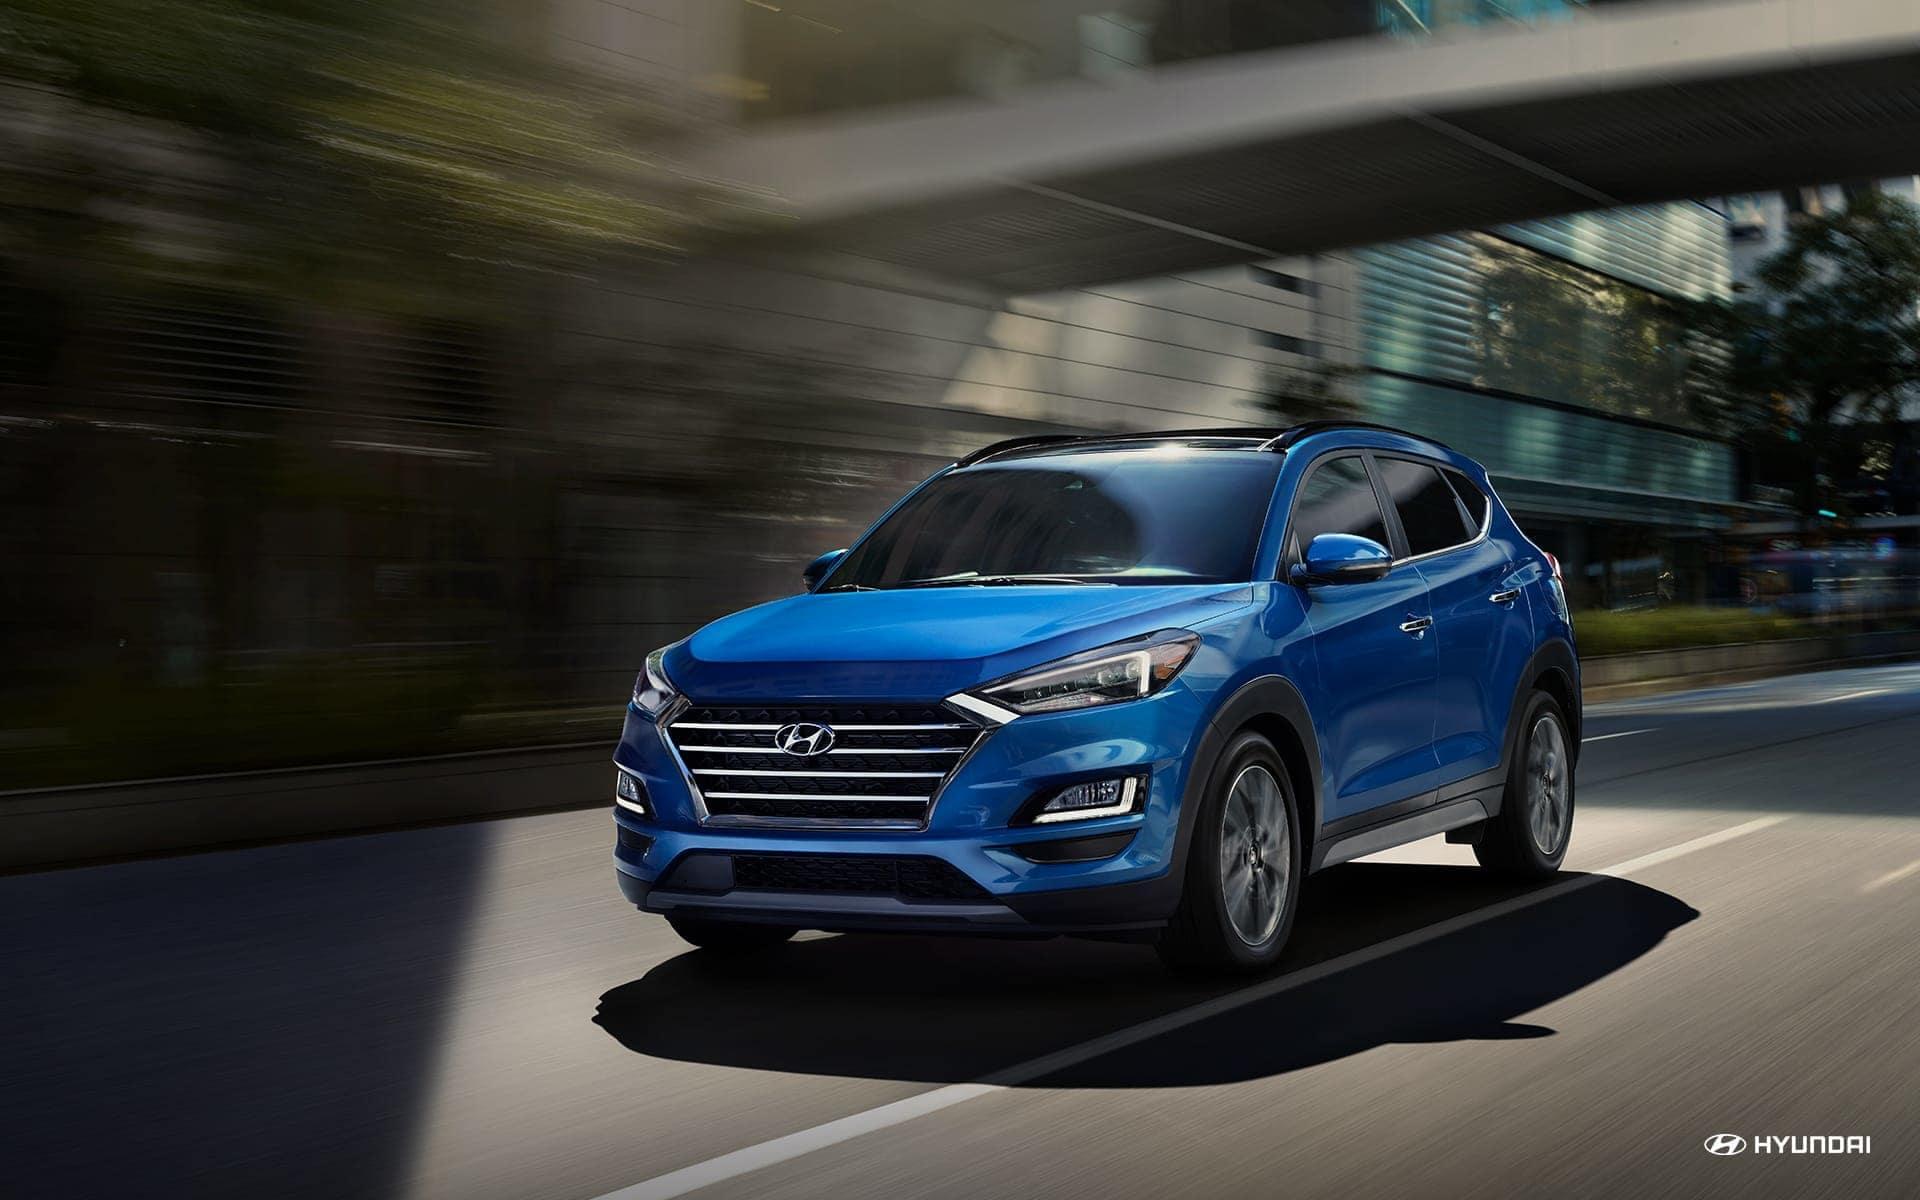 2019 Hyundai Tucson driving down road